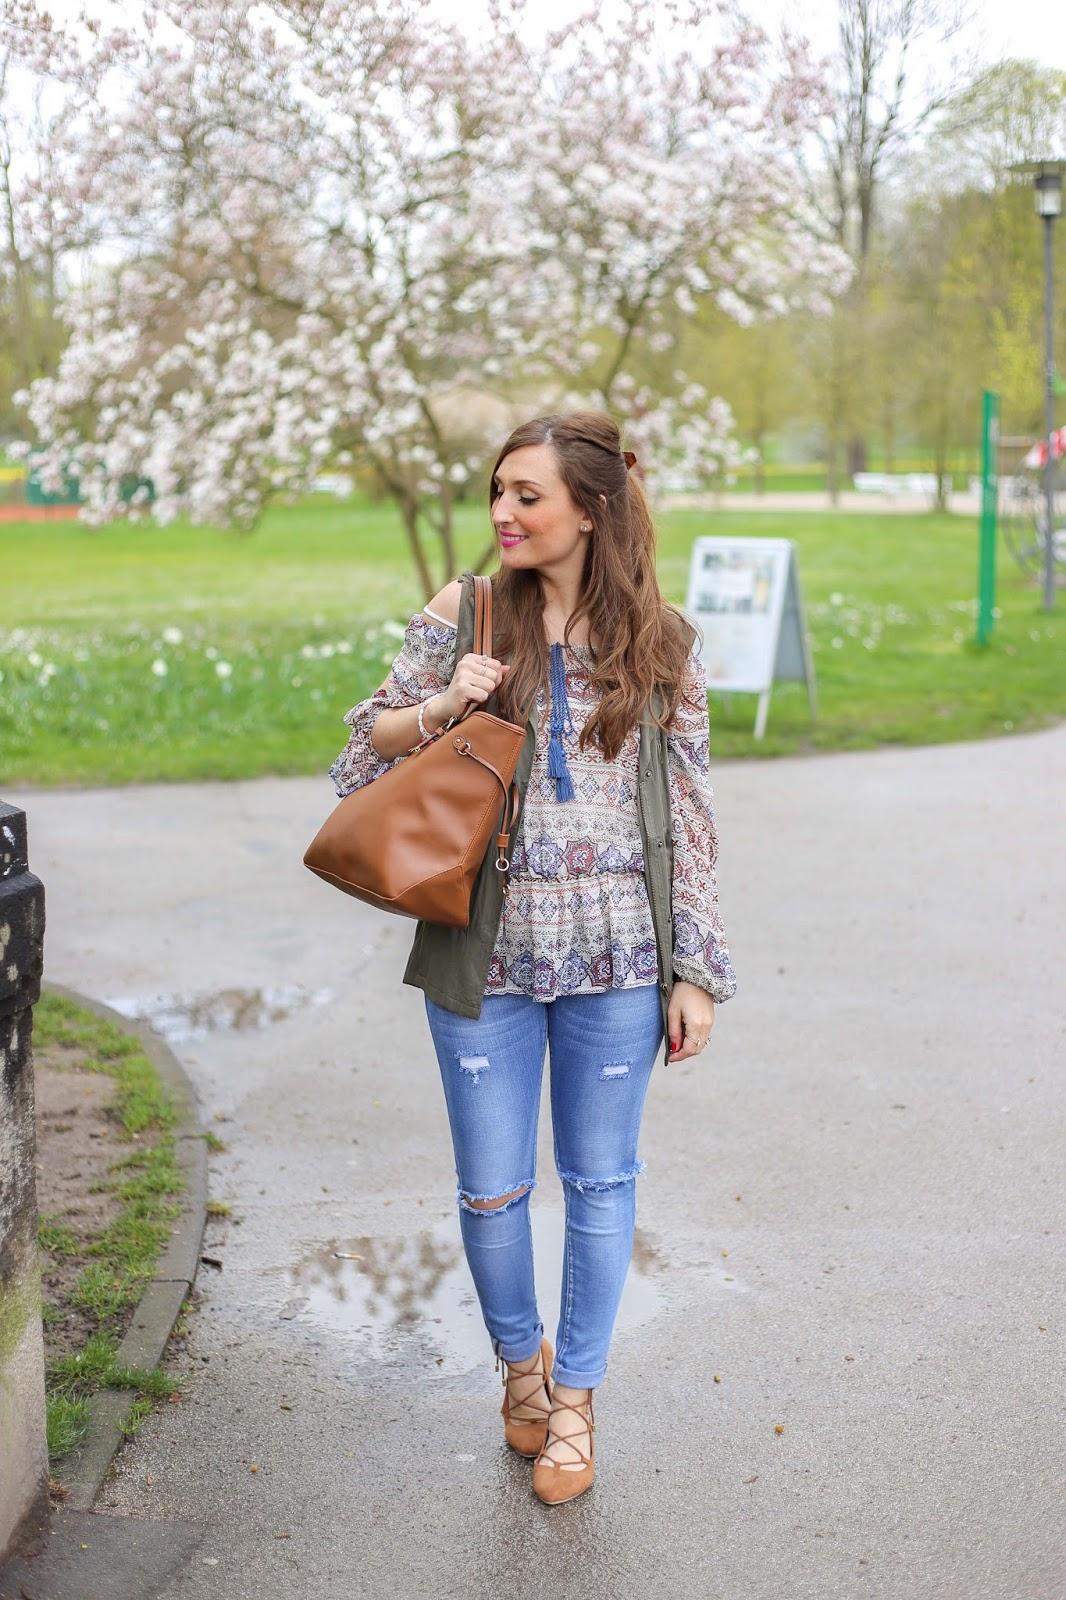 Khaki Blazer - Khaki Jacke Fashionblogger - Off-Shoulder top - Fashionstylebyjohanna - braune Flats Blogger